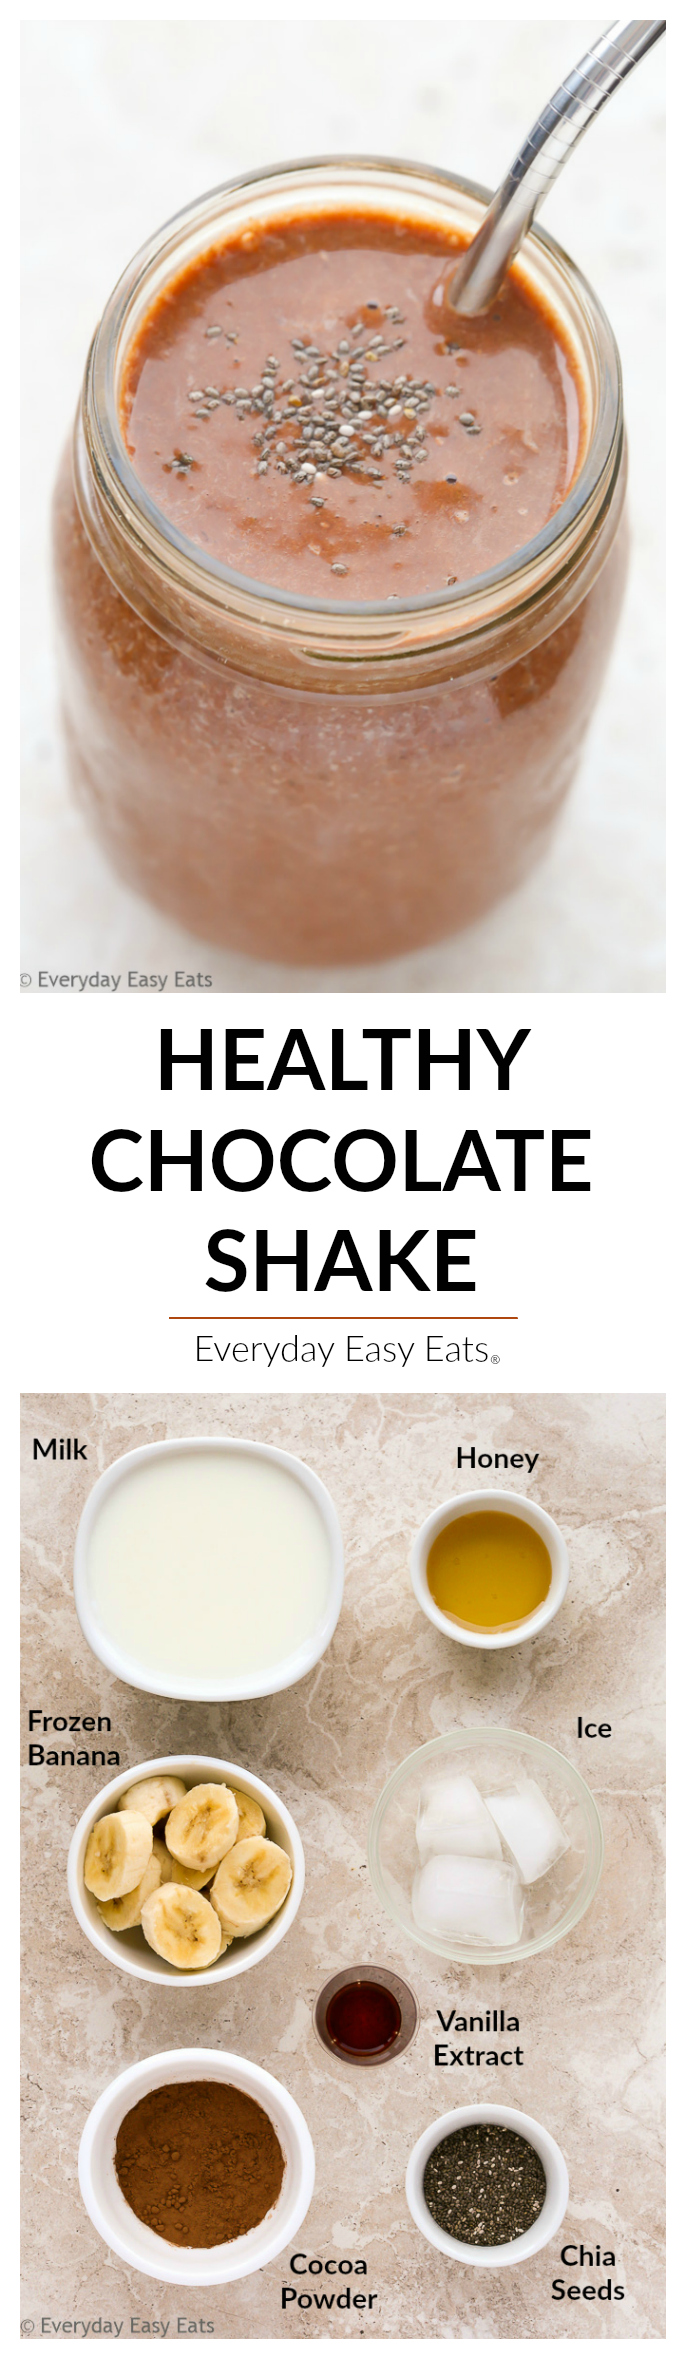 Healthy Chocolate Shake | Everyday Easy Eats